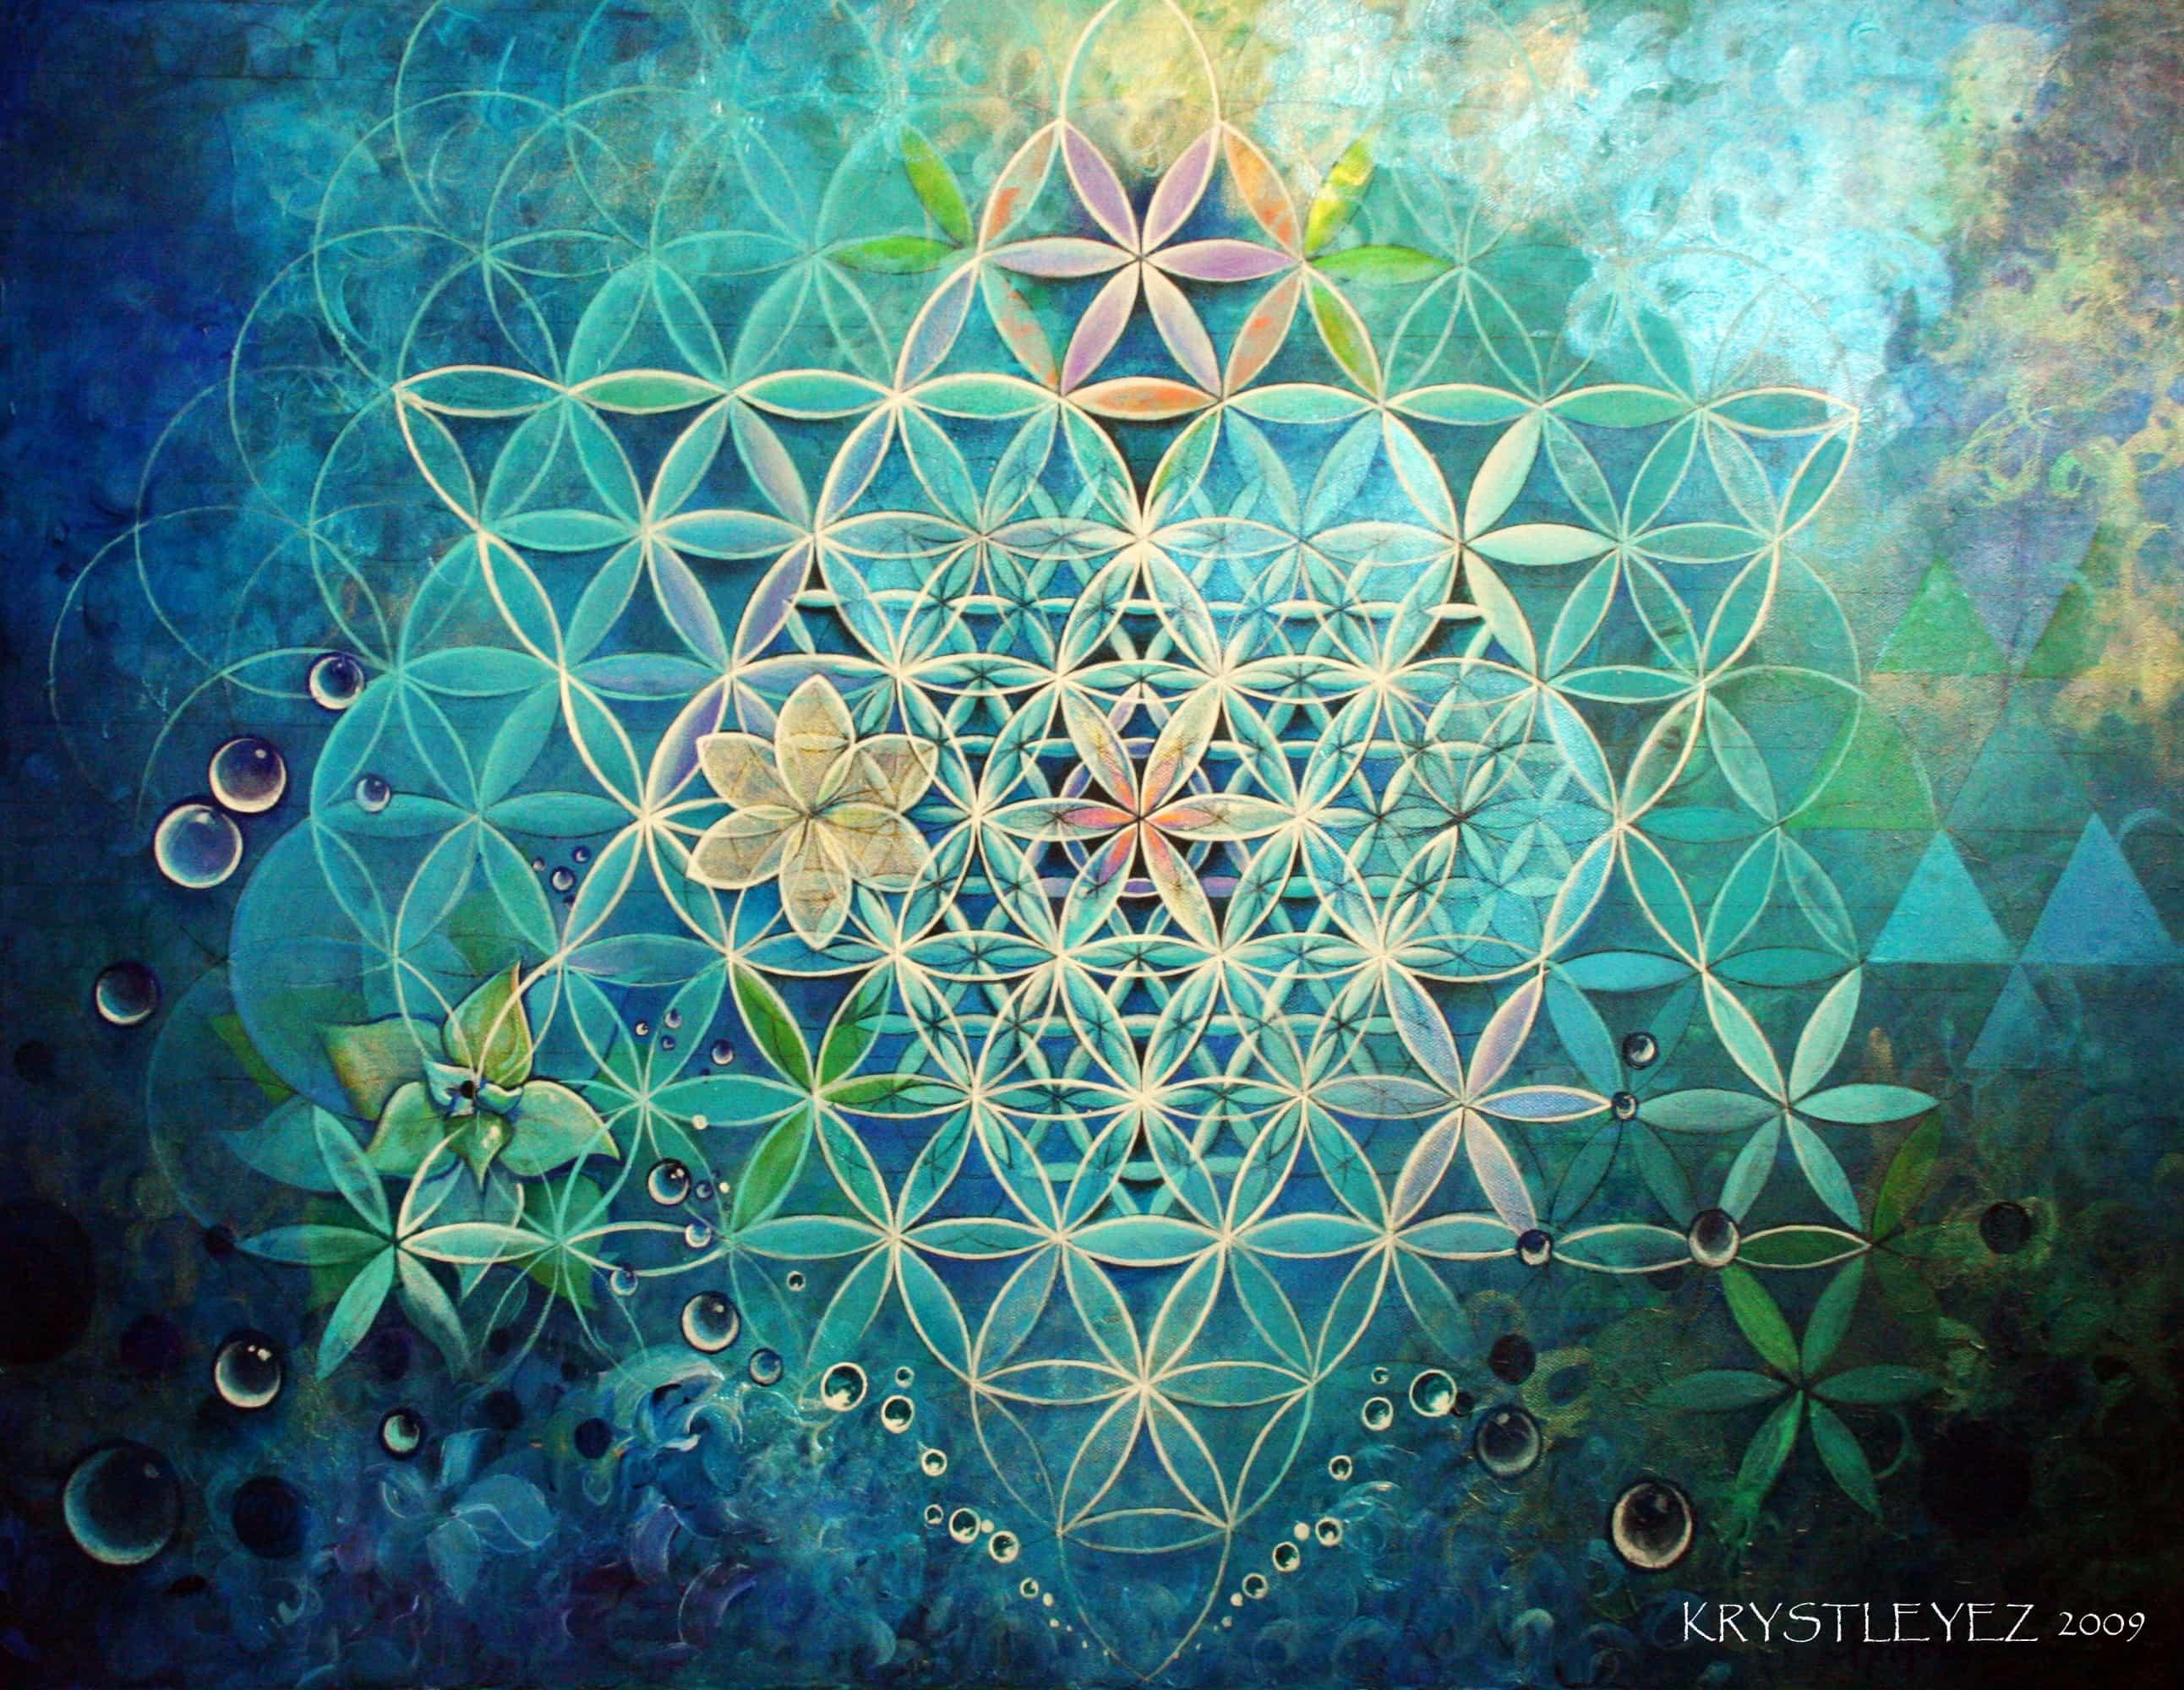 Visionary art and sacred geometry sociedelic - Meditation art wallpaper ...